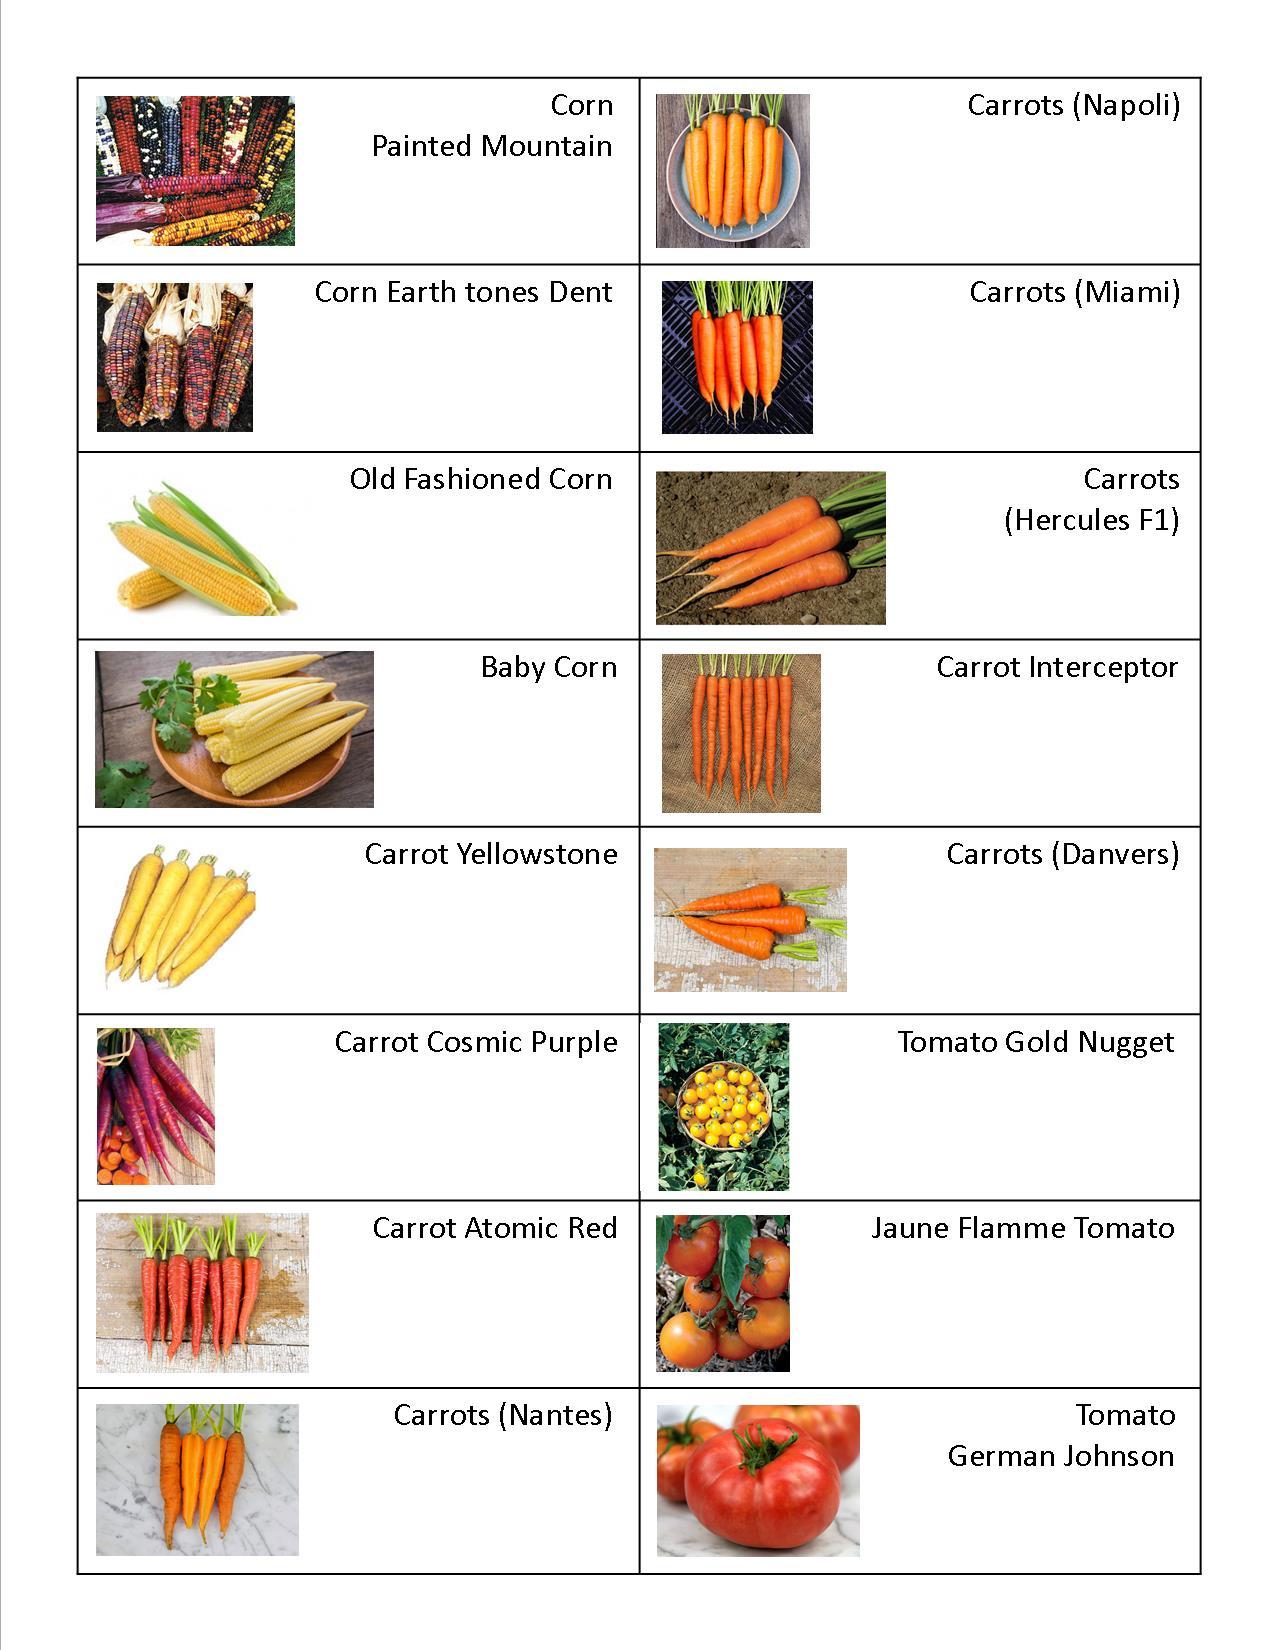 Carrot, Tomato